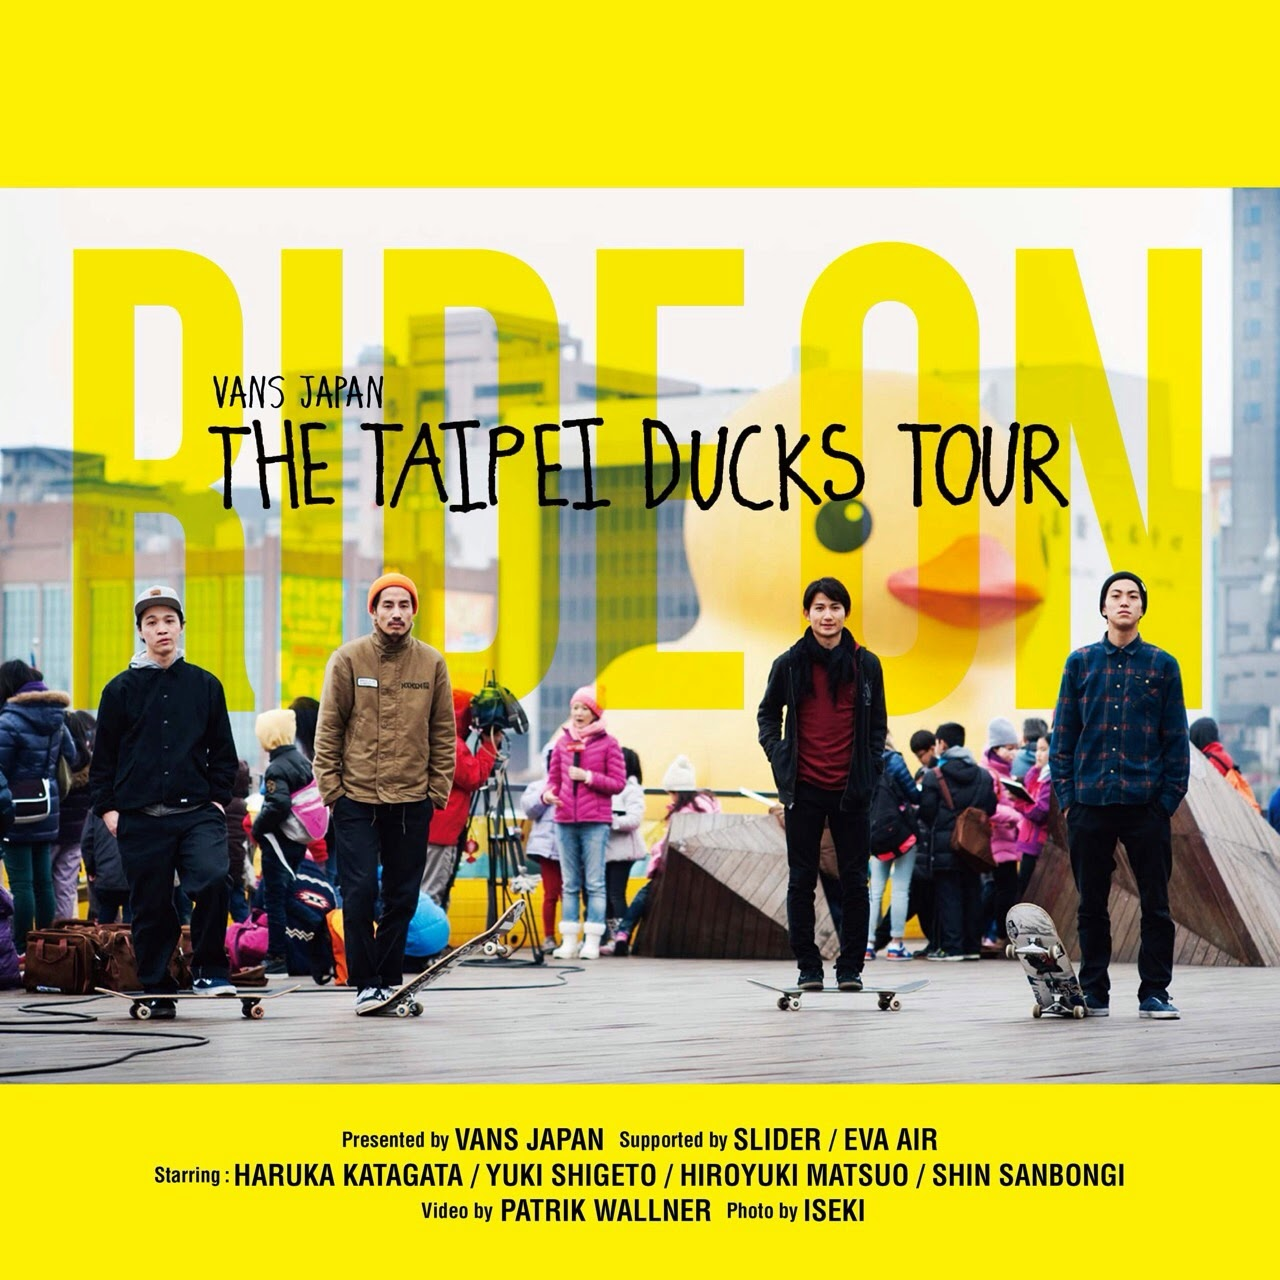 http://www.vhsmag.com/rideon/vans-japan-the-taipei-ducks-tour/